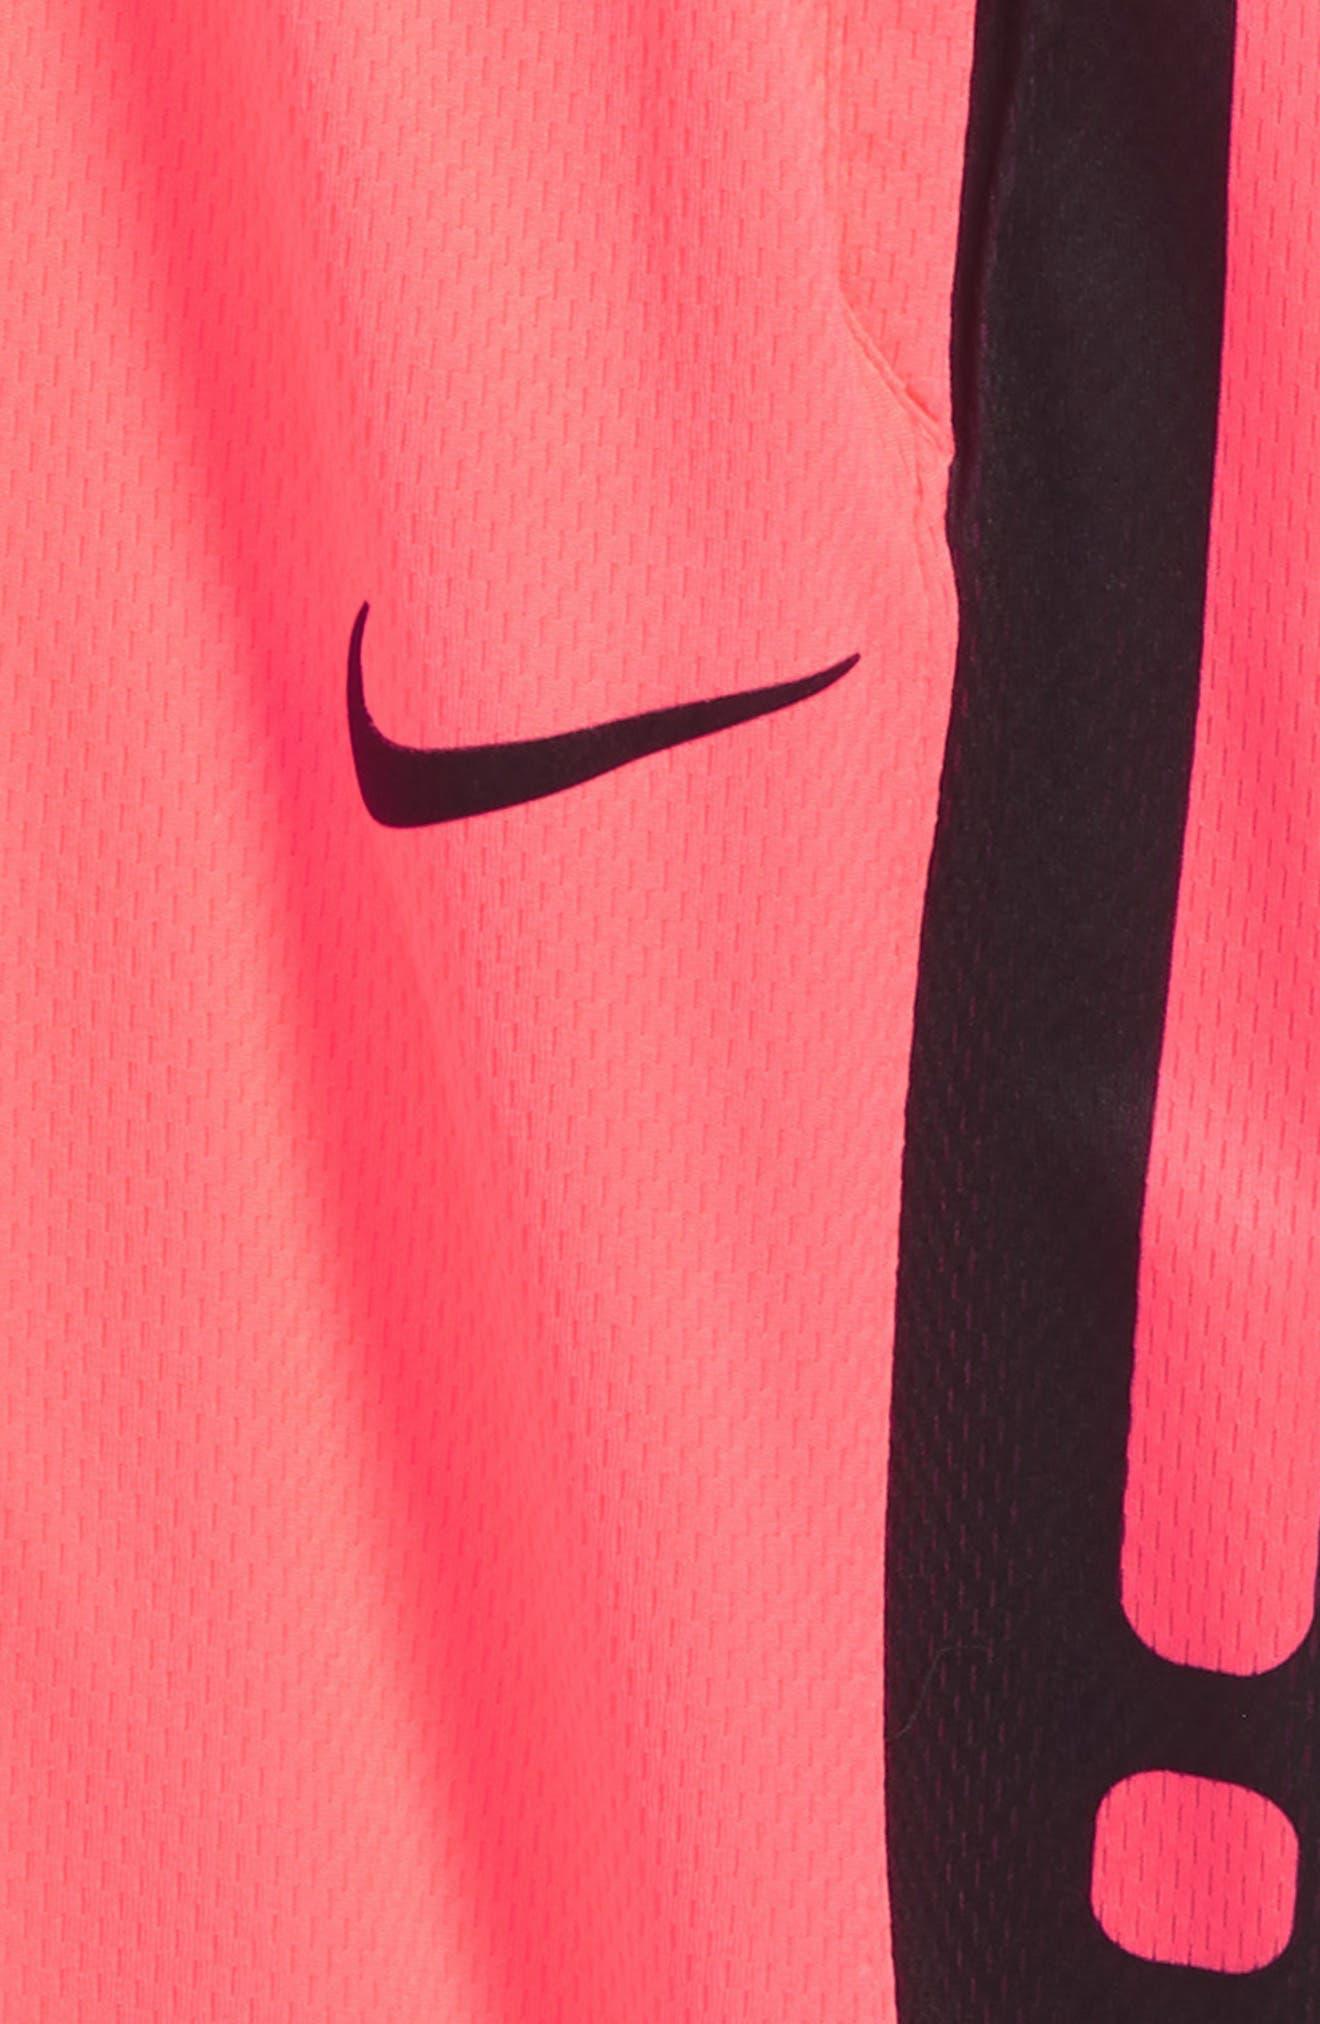 Dry Elite Basketball Shorts,                             Alternate thumbnail 3, color,                             Hot Punch/ Black